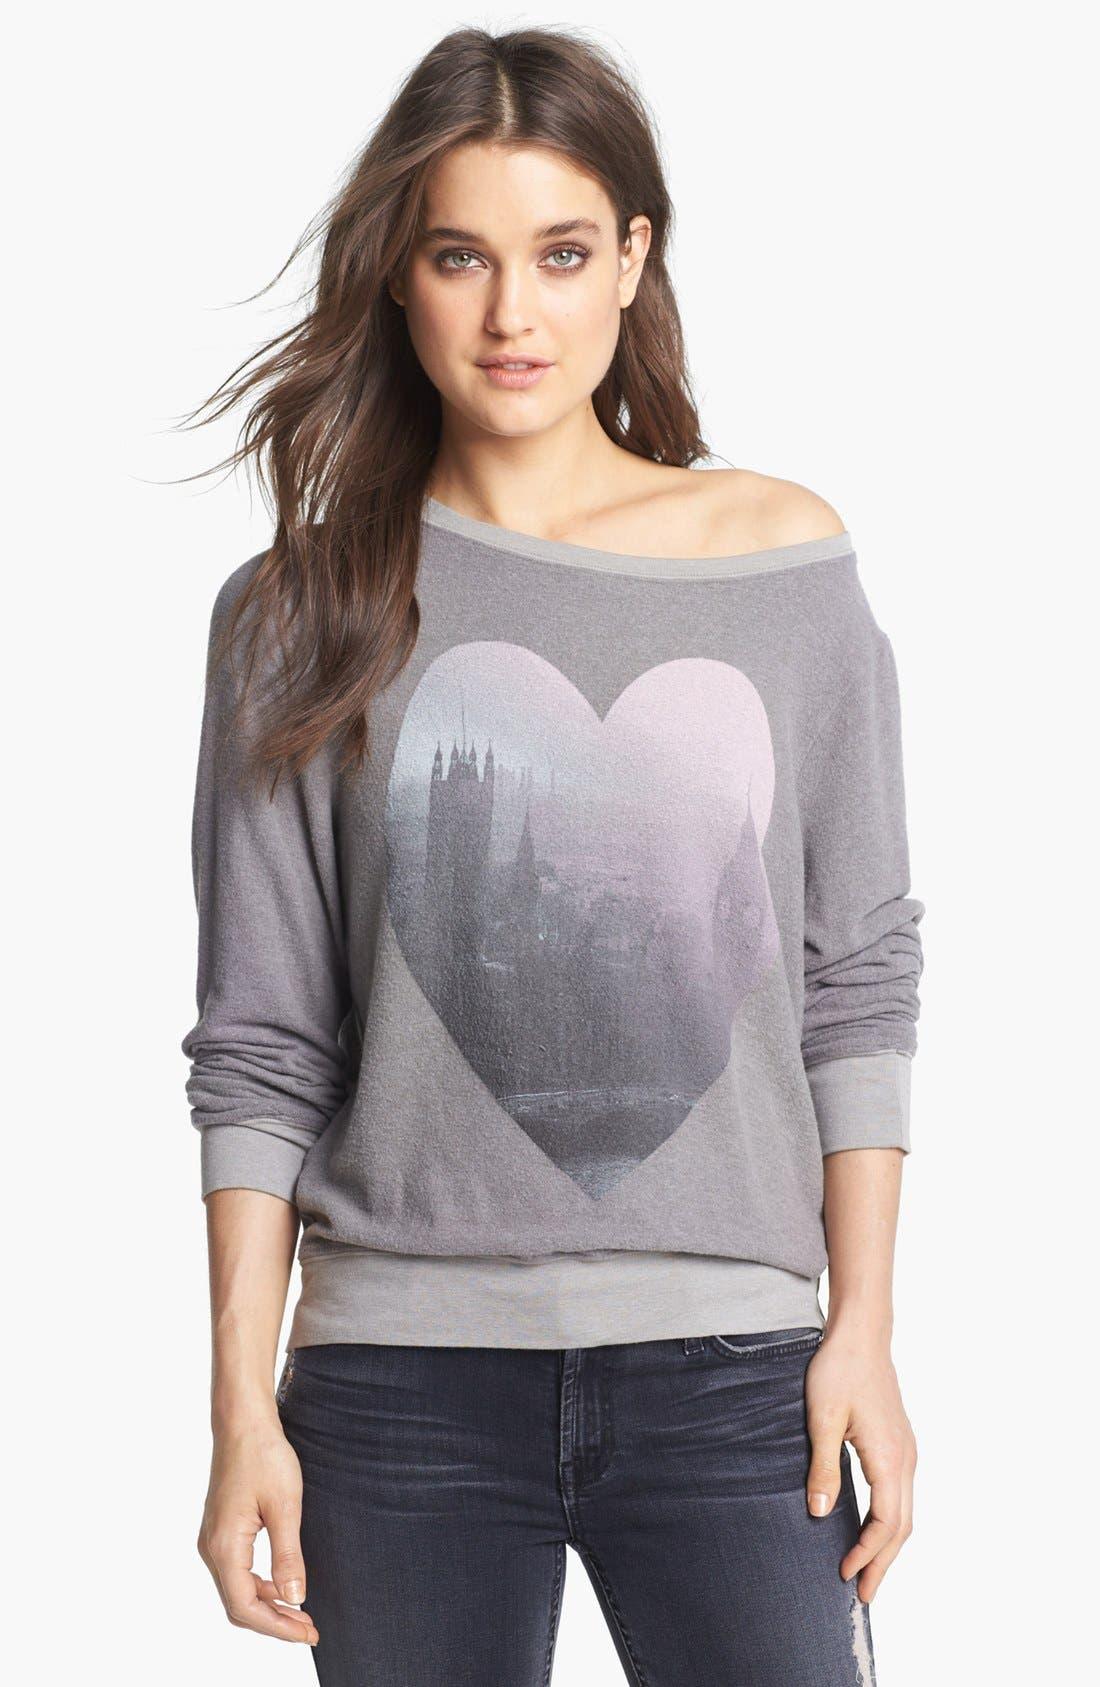 Main Image - Wildfox 'London Heart' Sweatshirt (Nordstrom Exclusive)